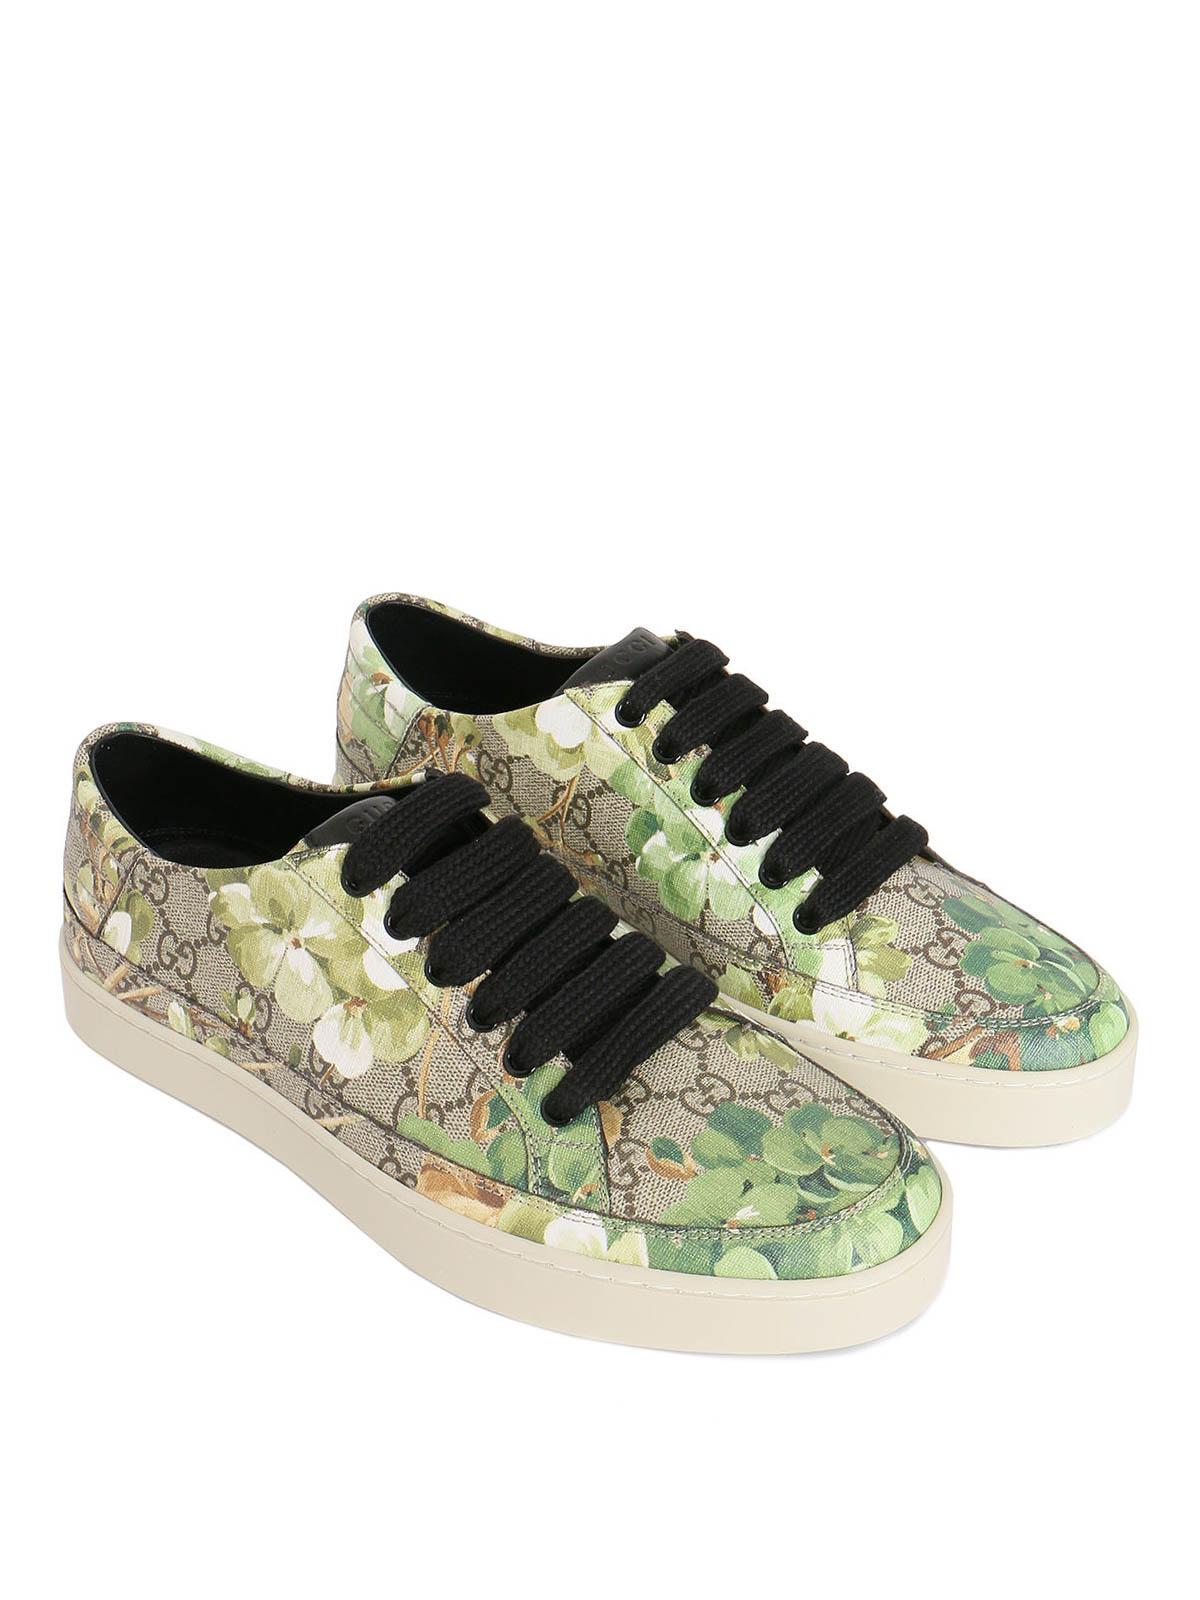 Gucci - Blooms print sneakers